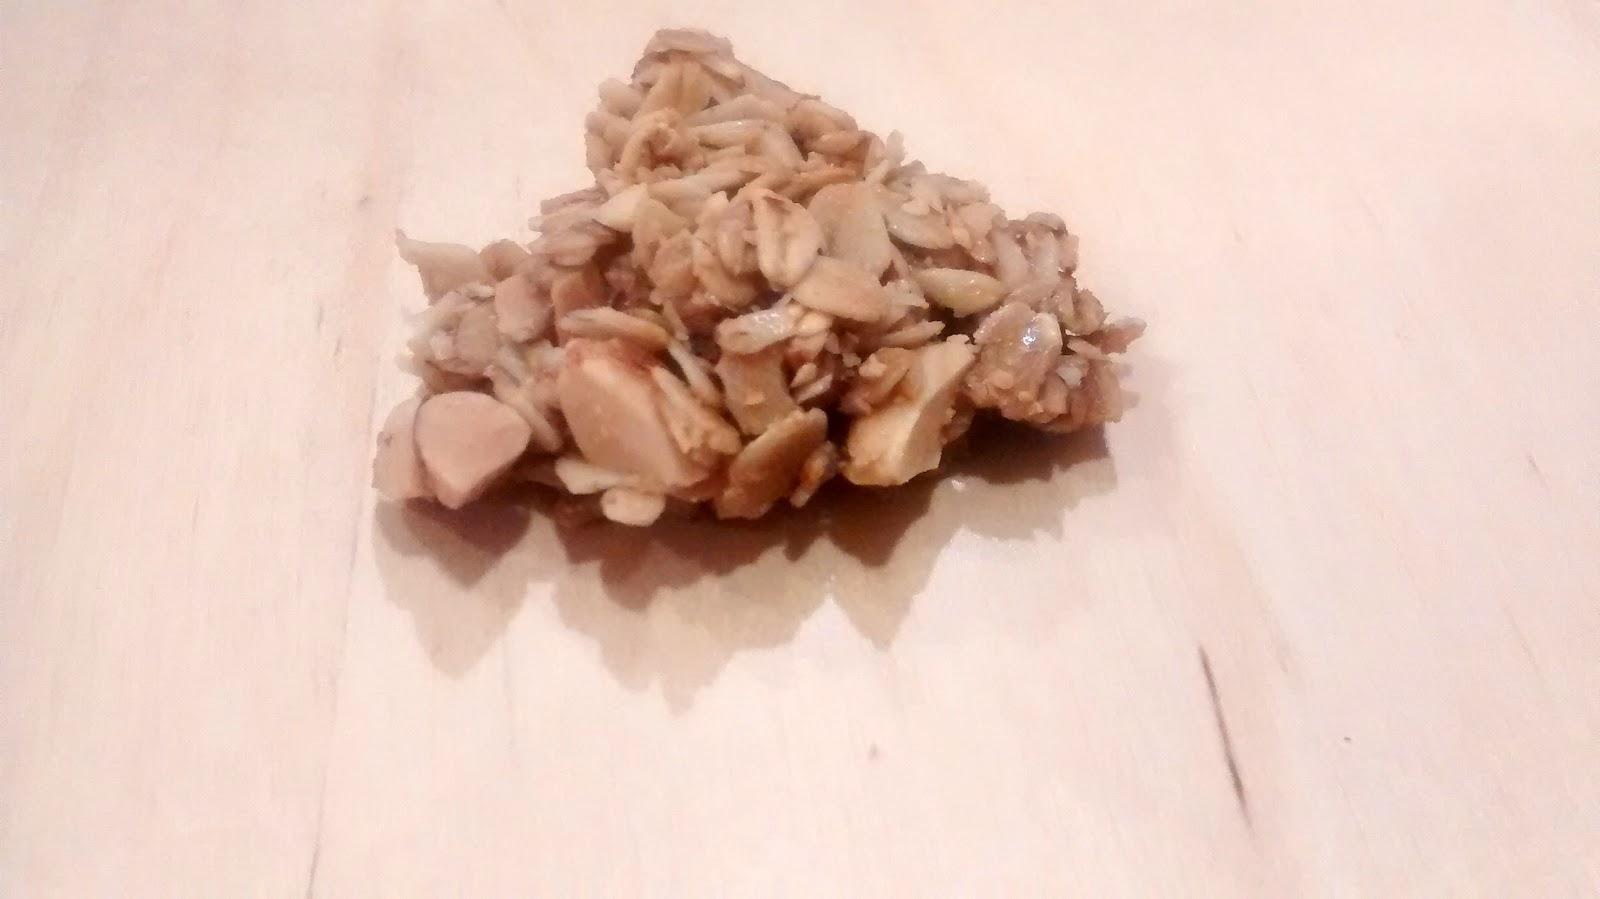 post-baking; a non-cranberry cluster of clumpalicious almond granola